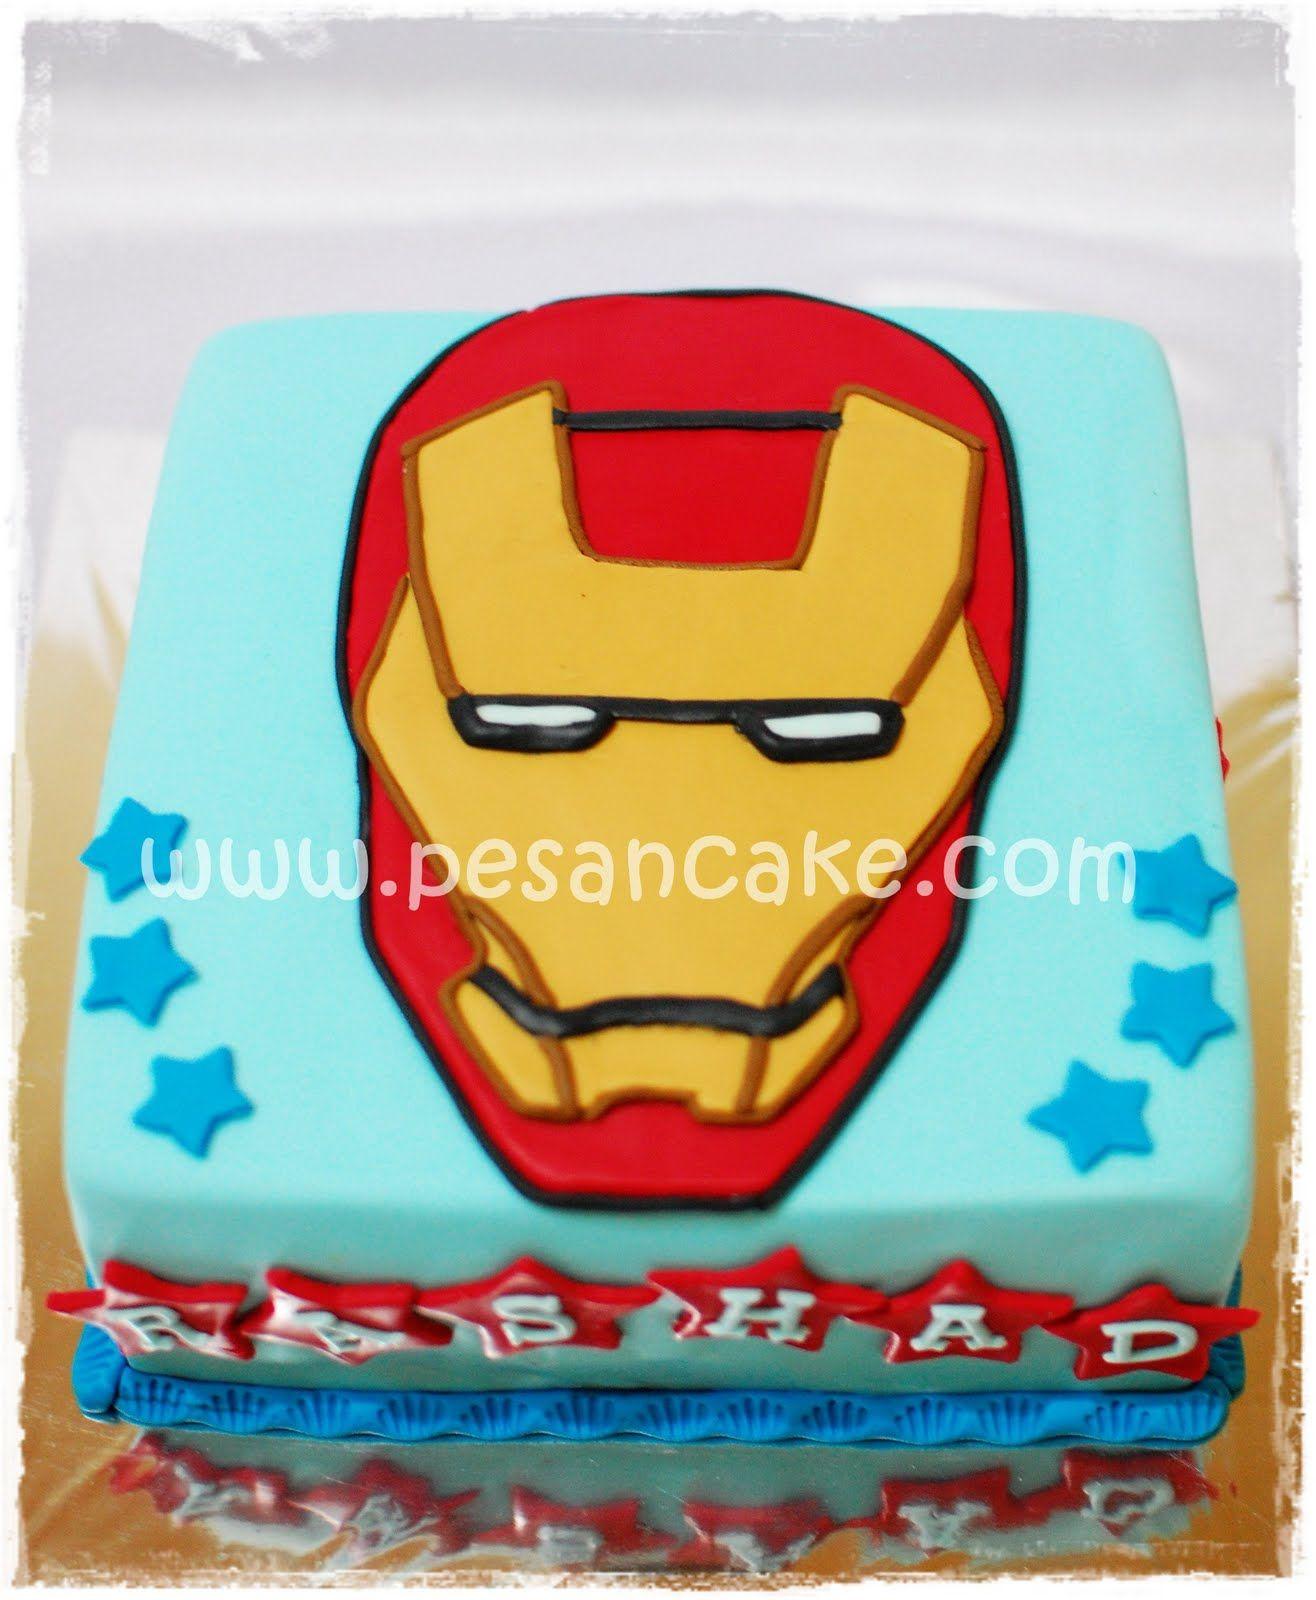 Cake Dgn Topeng Iron Man Cake Coklat Filling Ganache Uk 18x18 Cover